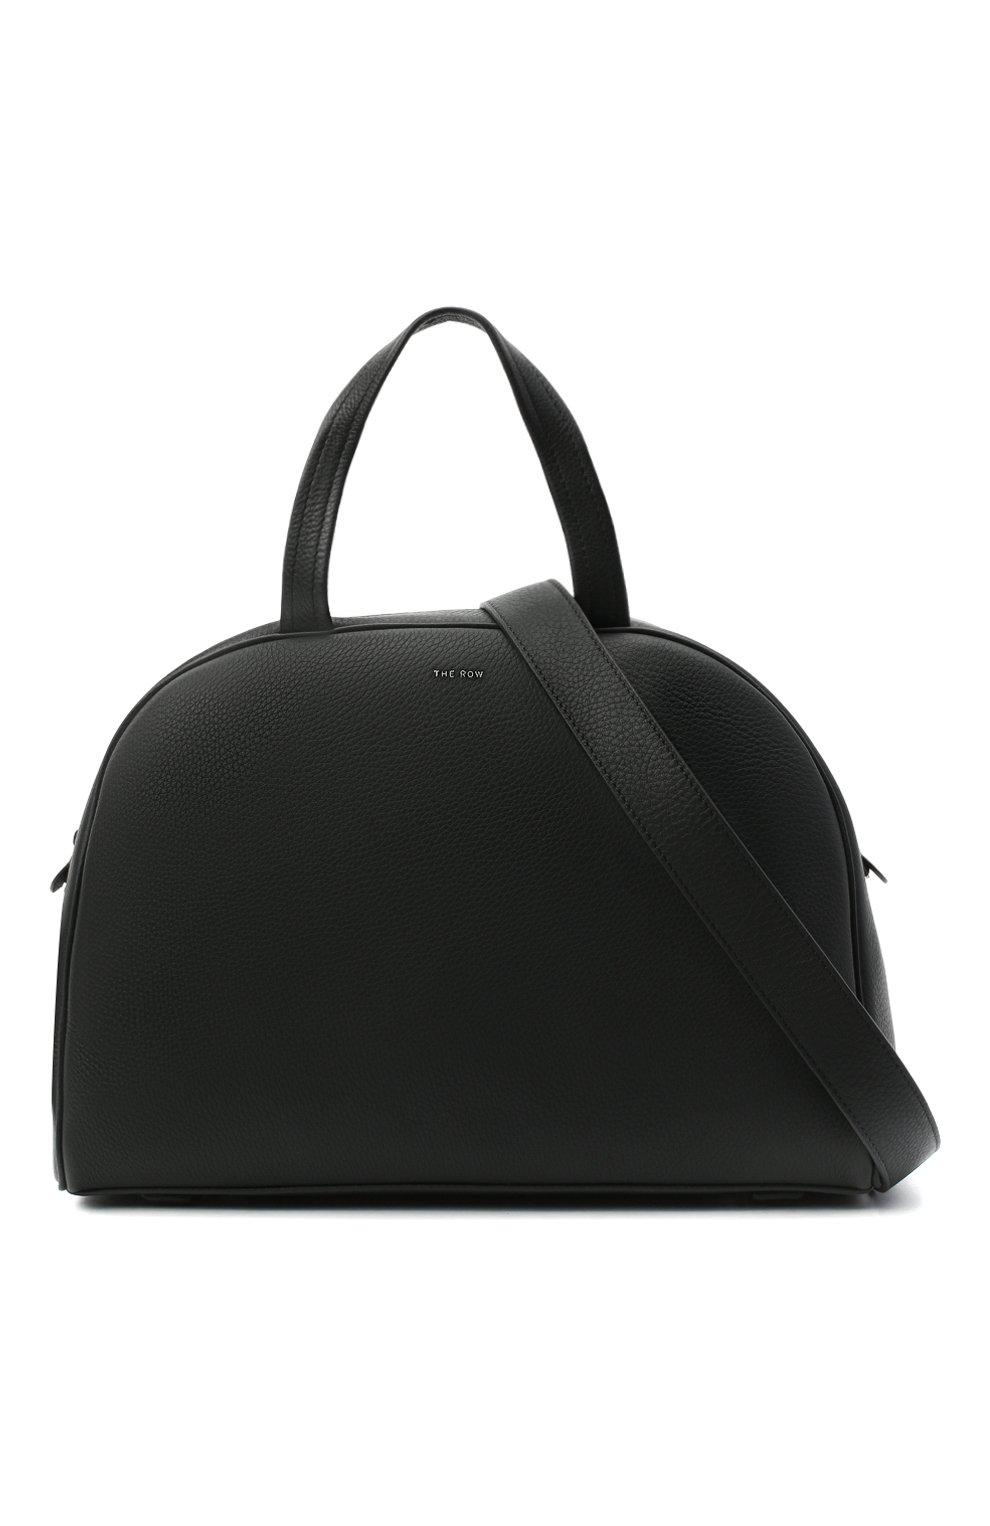 Женская сумка THE ROW черного цвета, арт. W1261L129 | Фото 6